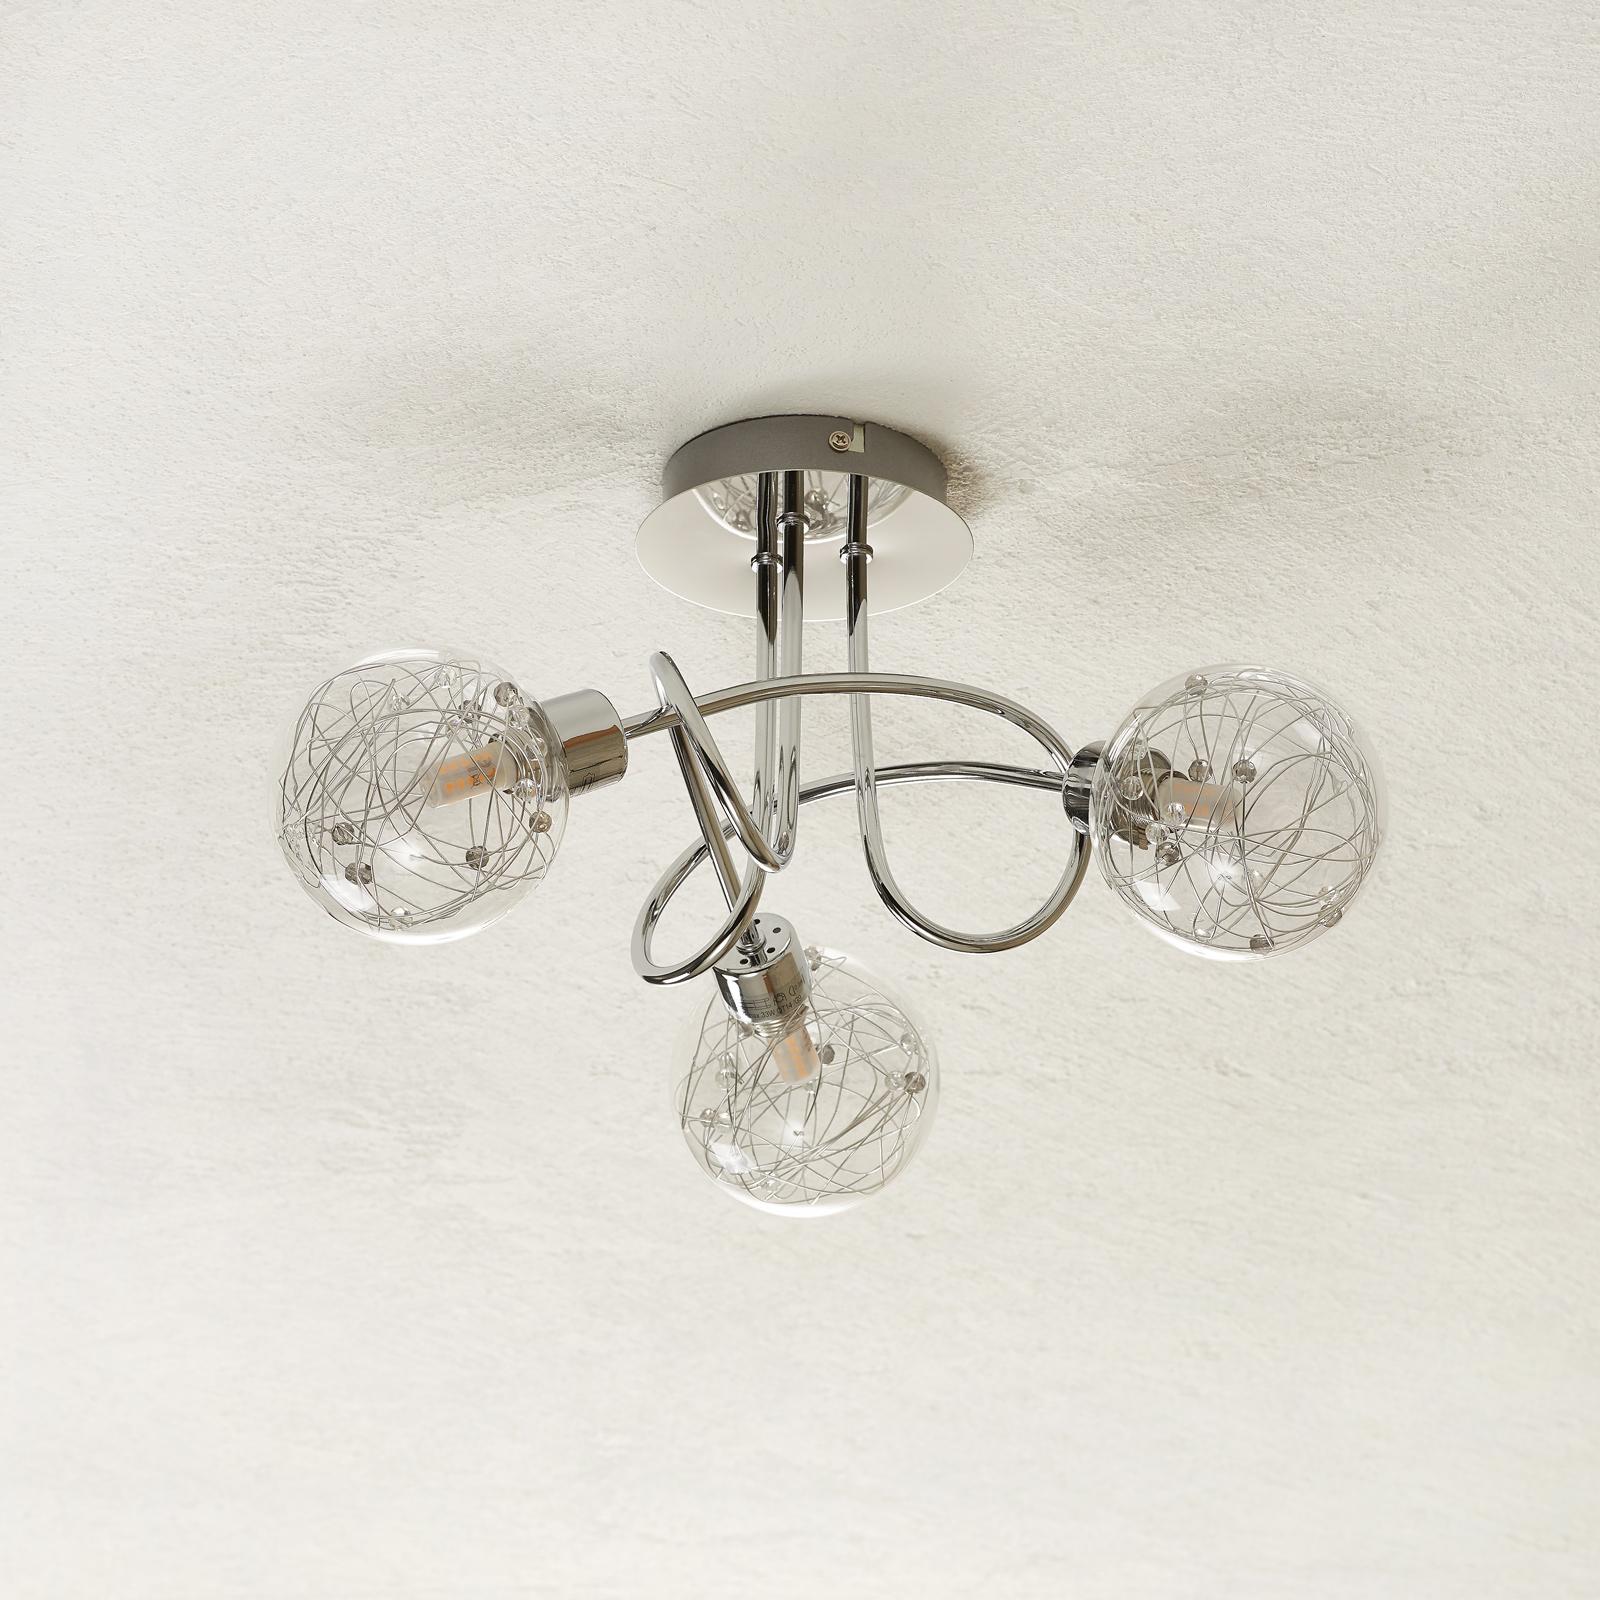 Joya - drielamps plafondlamp met glazen kappen